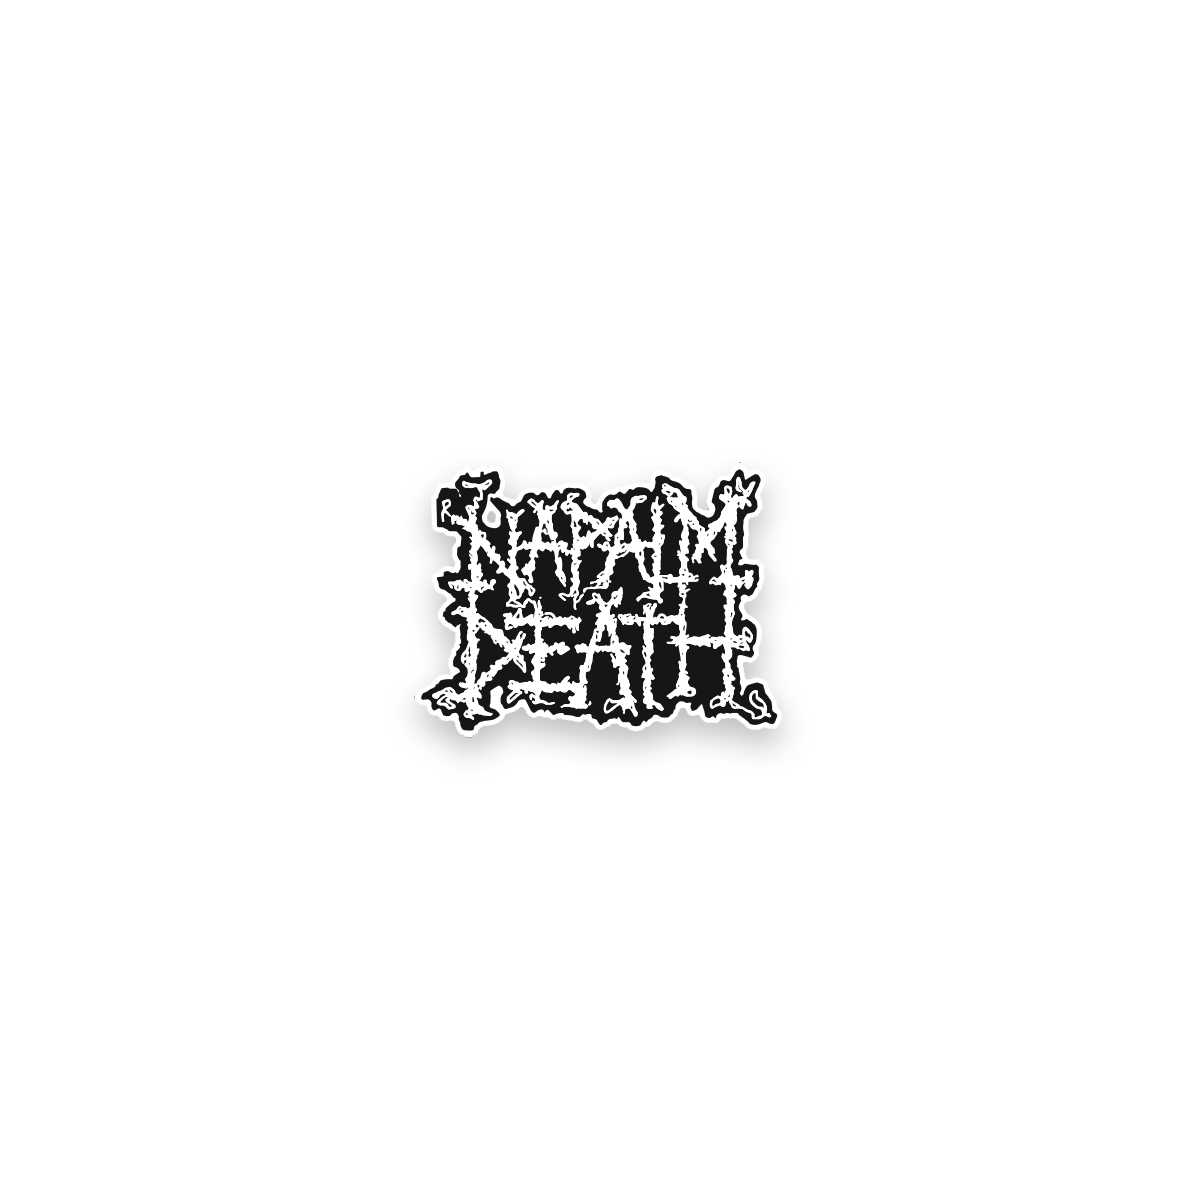 Napalm Death - Utilitarian (Decibel Edition) BLUE SMOKE LP + Standard Jacket